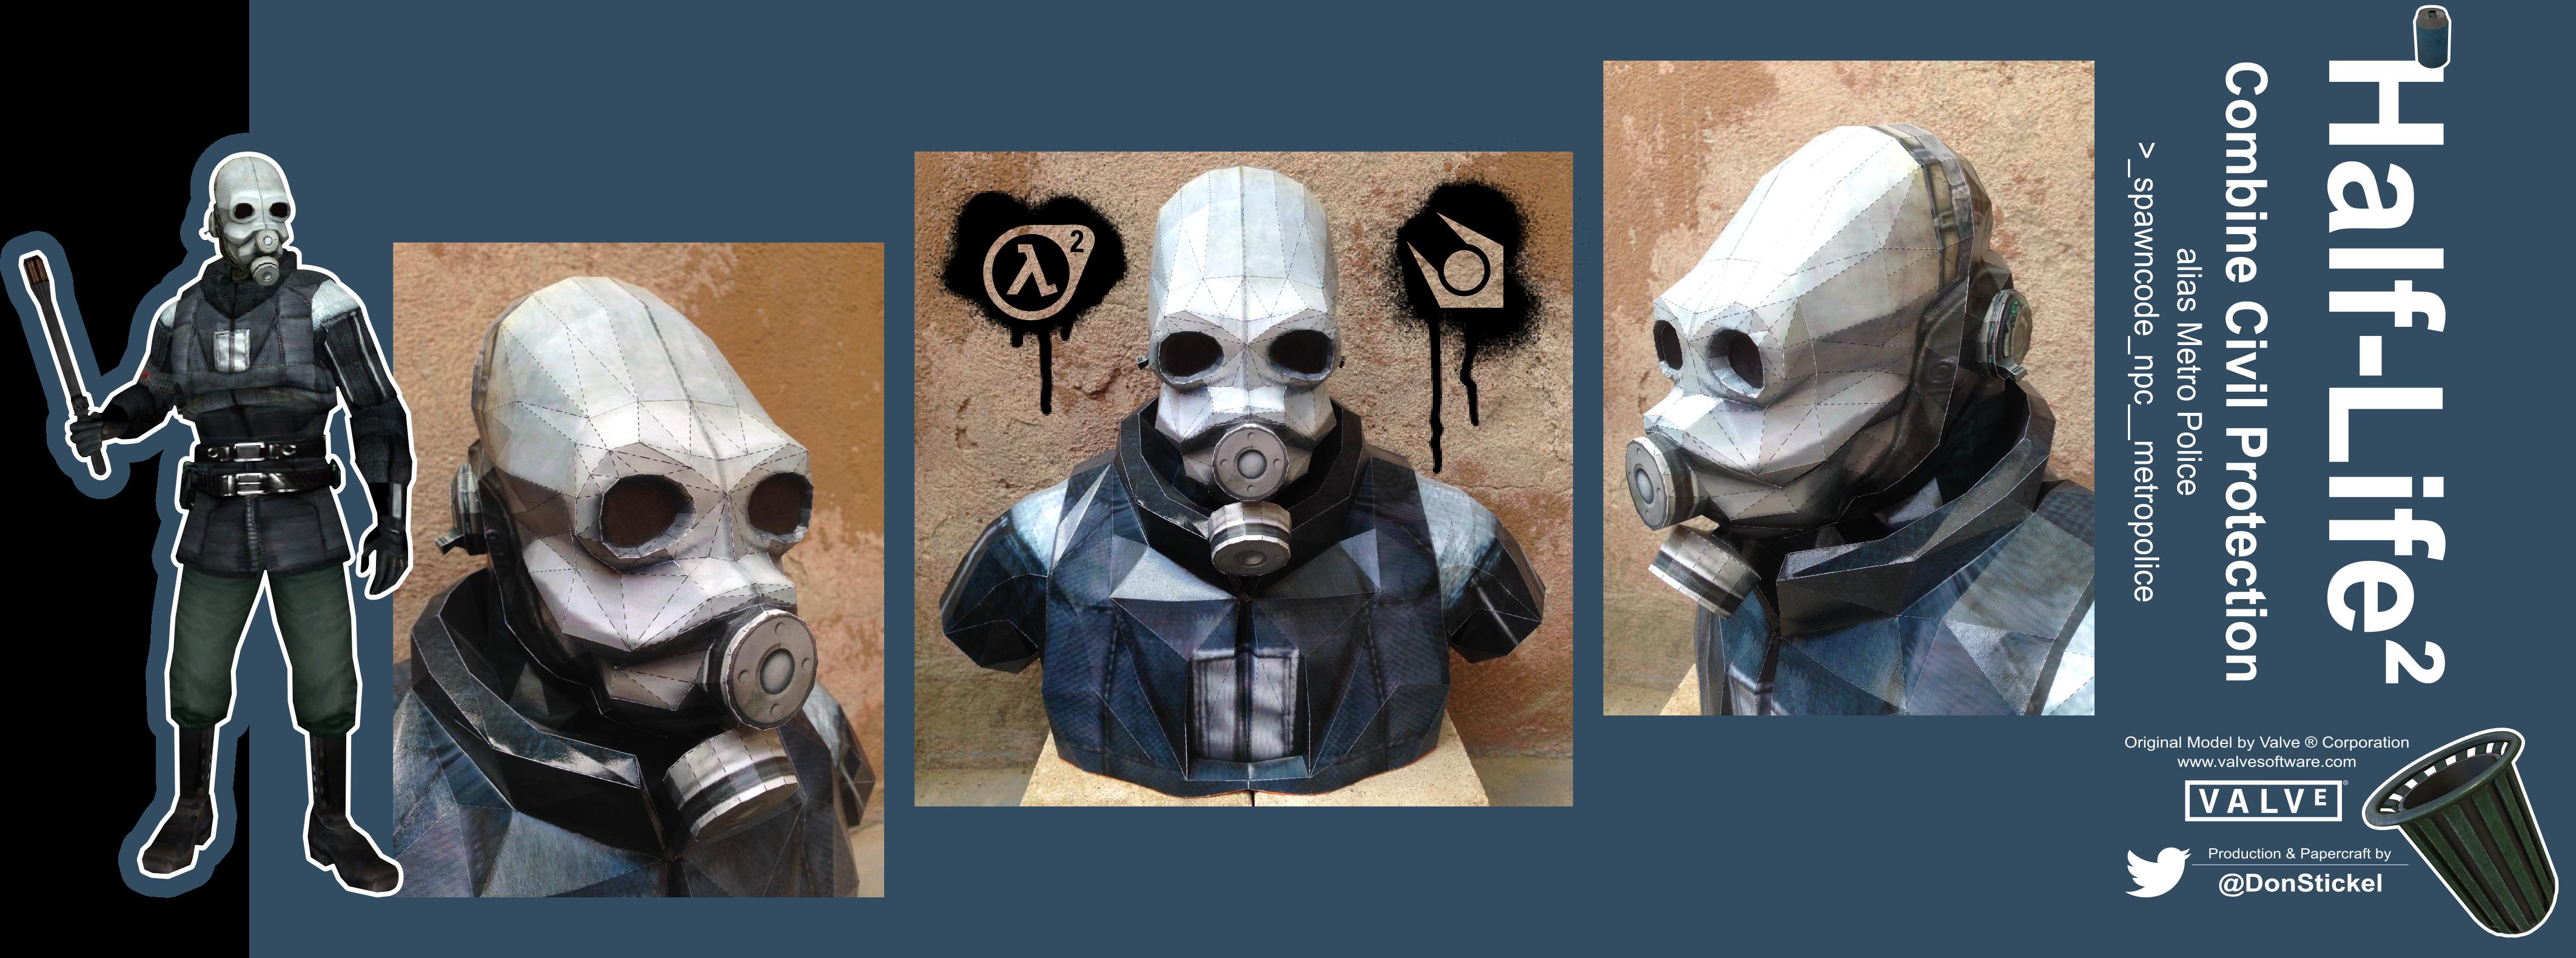 Civil Protection Toys : Cretaceous gas mask by furrydragon